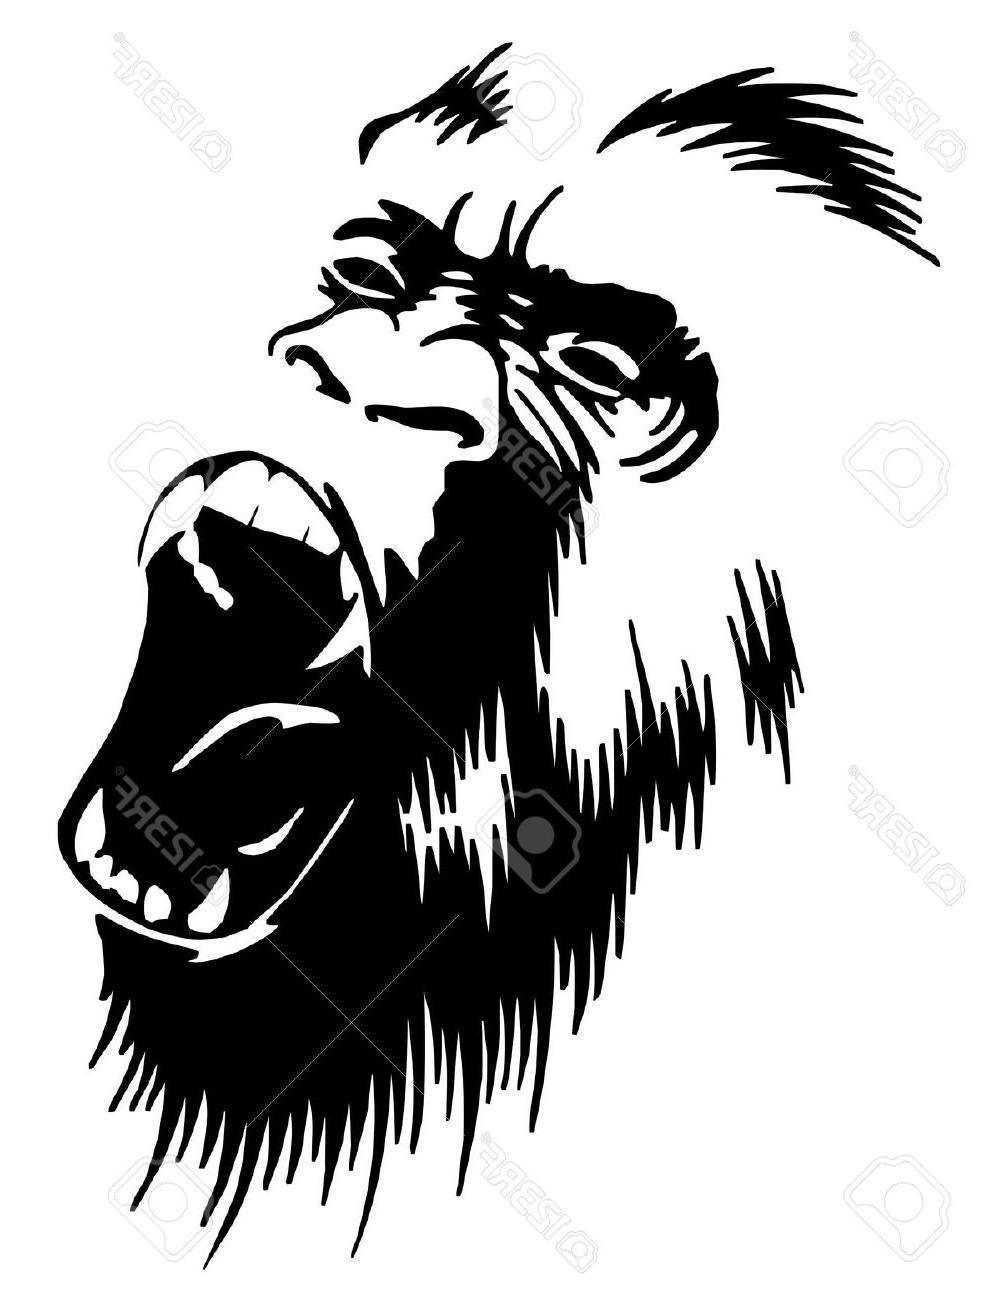 1004x1300 Unique Gorilla Roar Vector Image Free Vector Art, Images